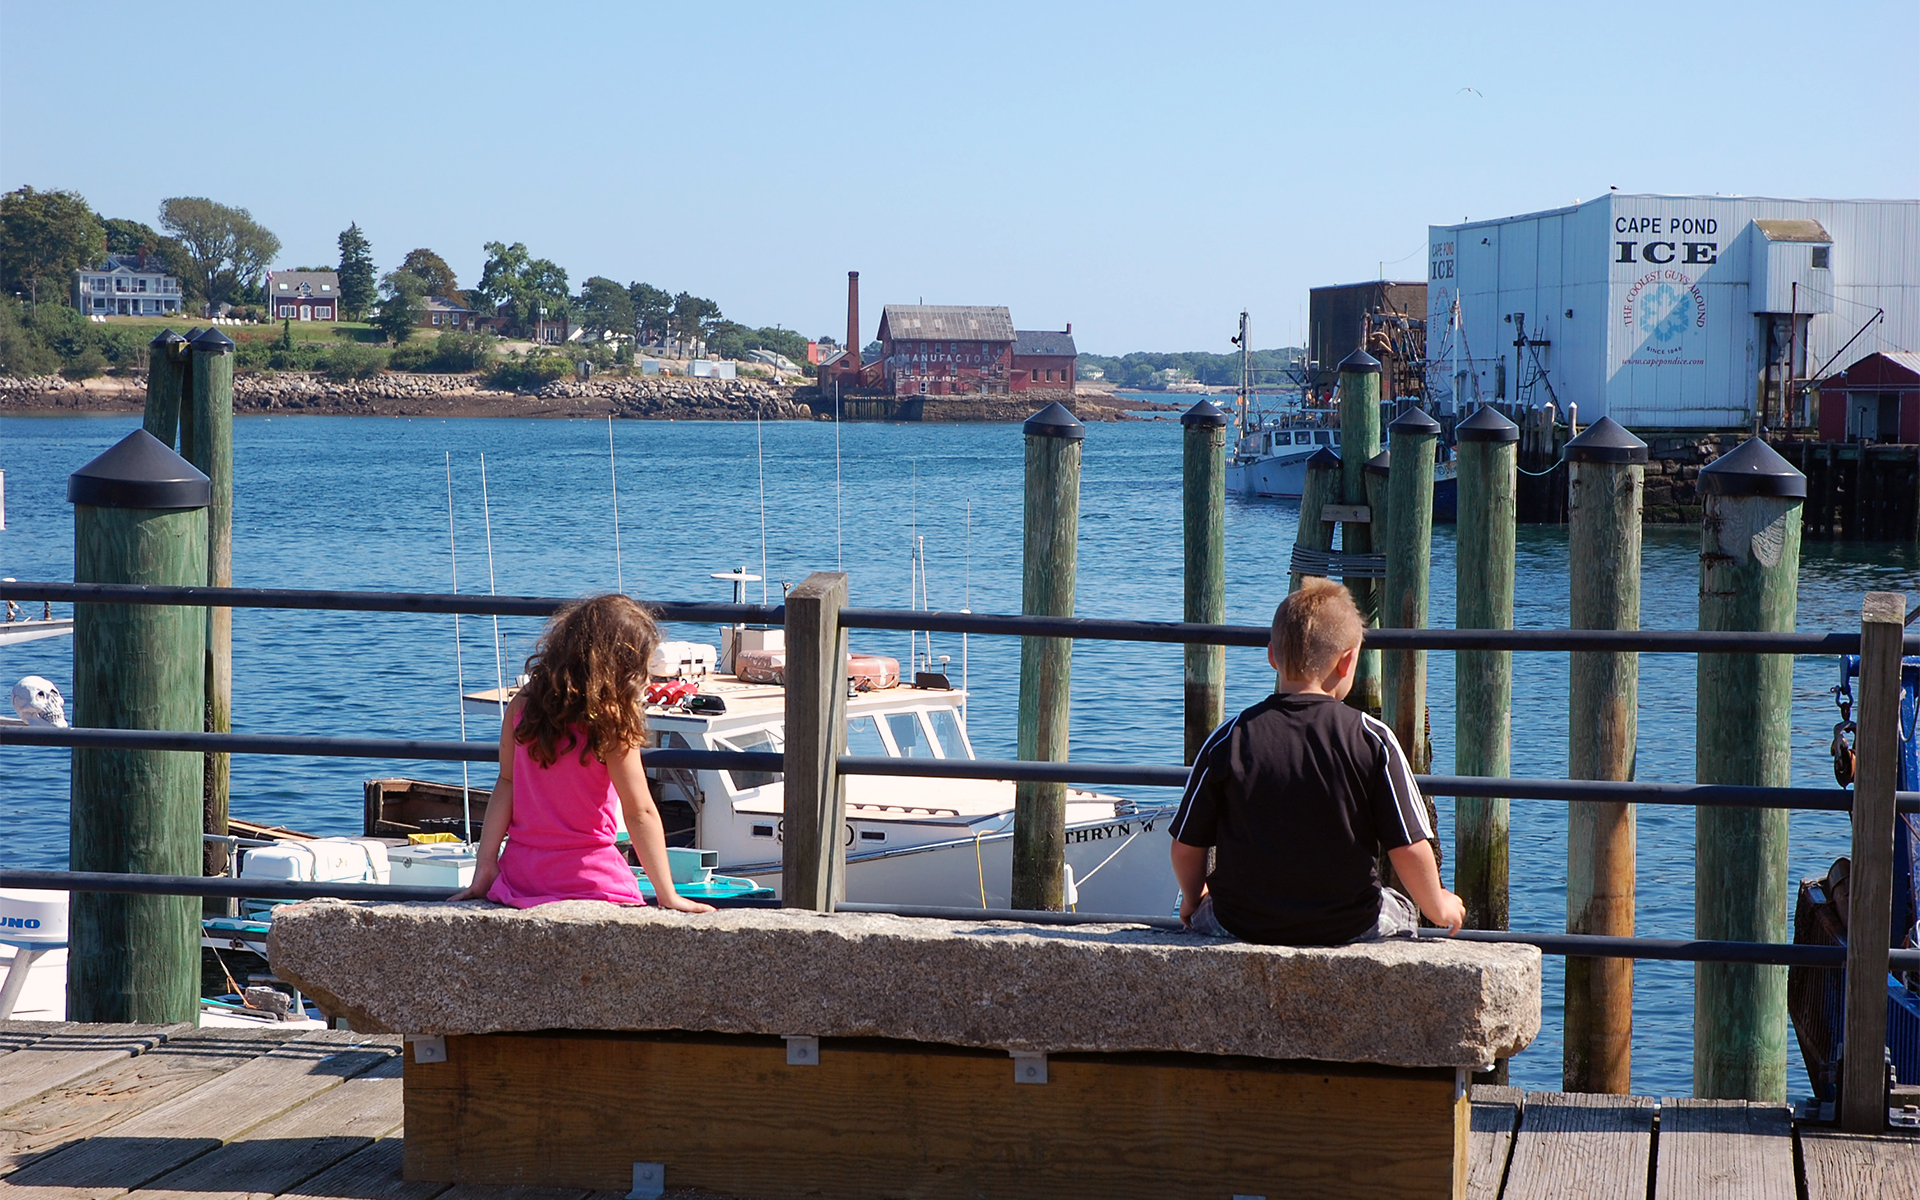 Boy and Girl at the Harborwalk